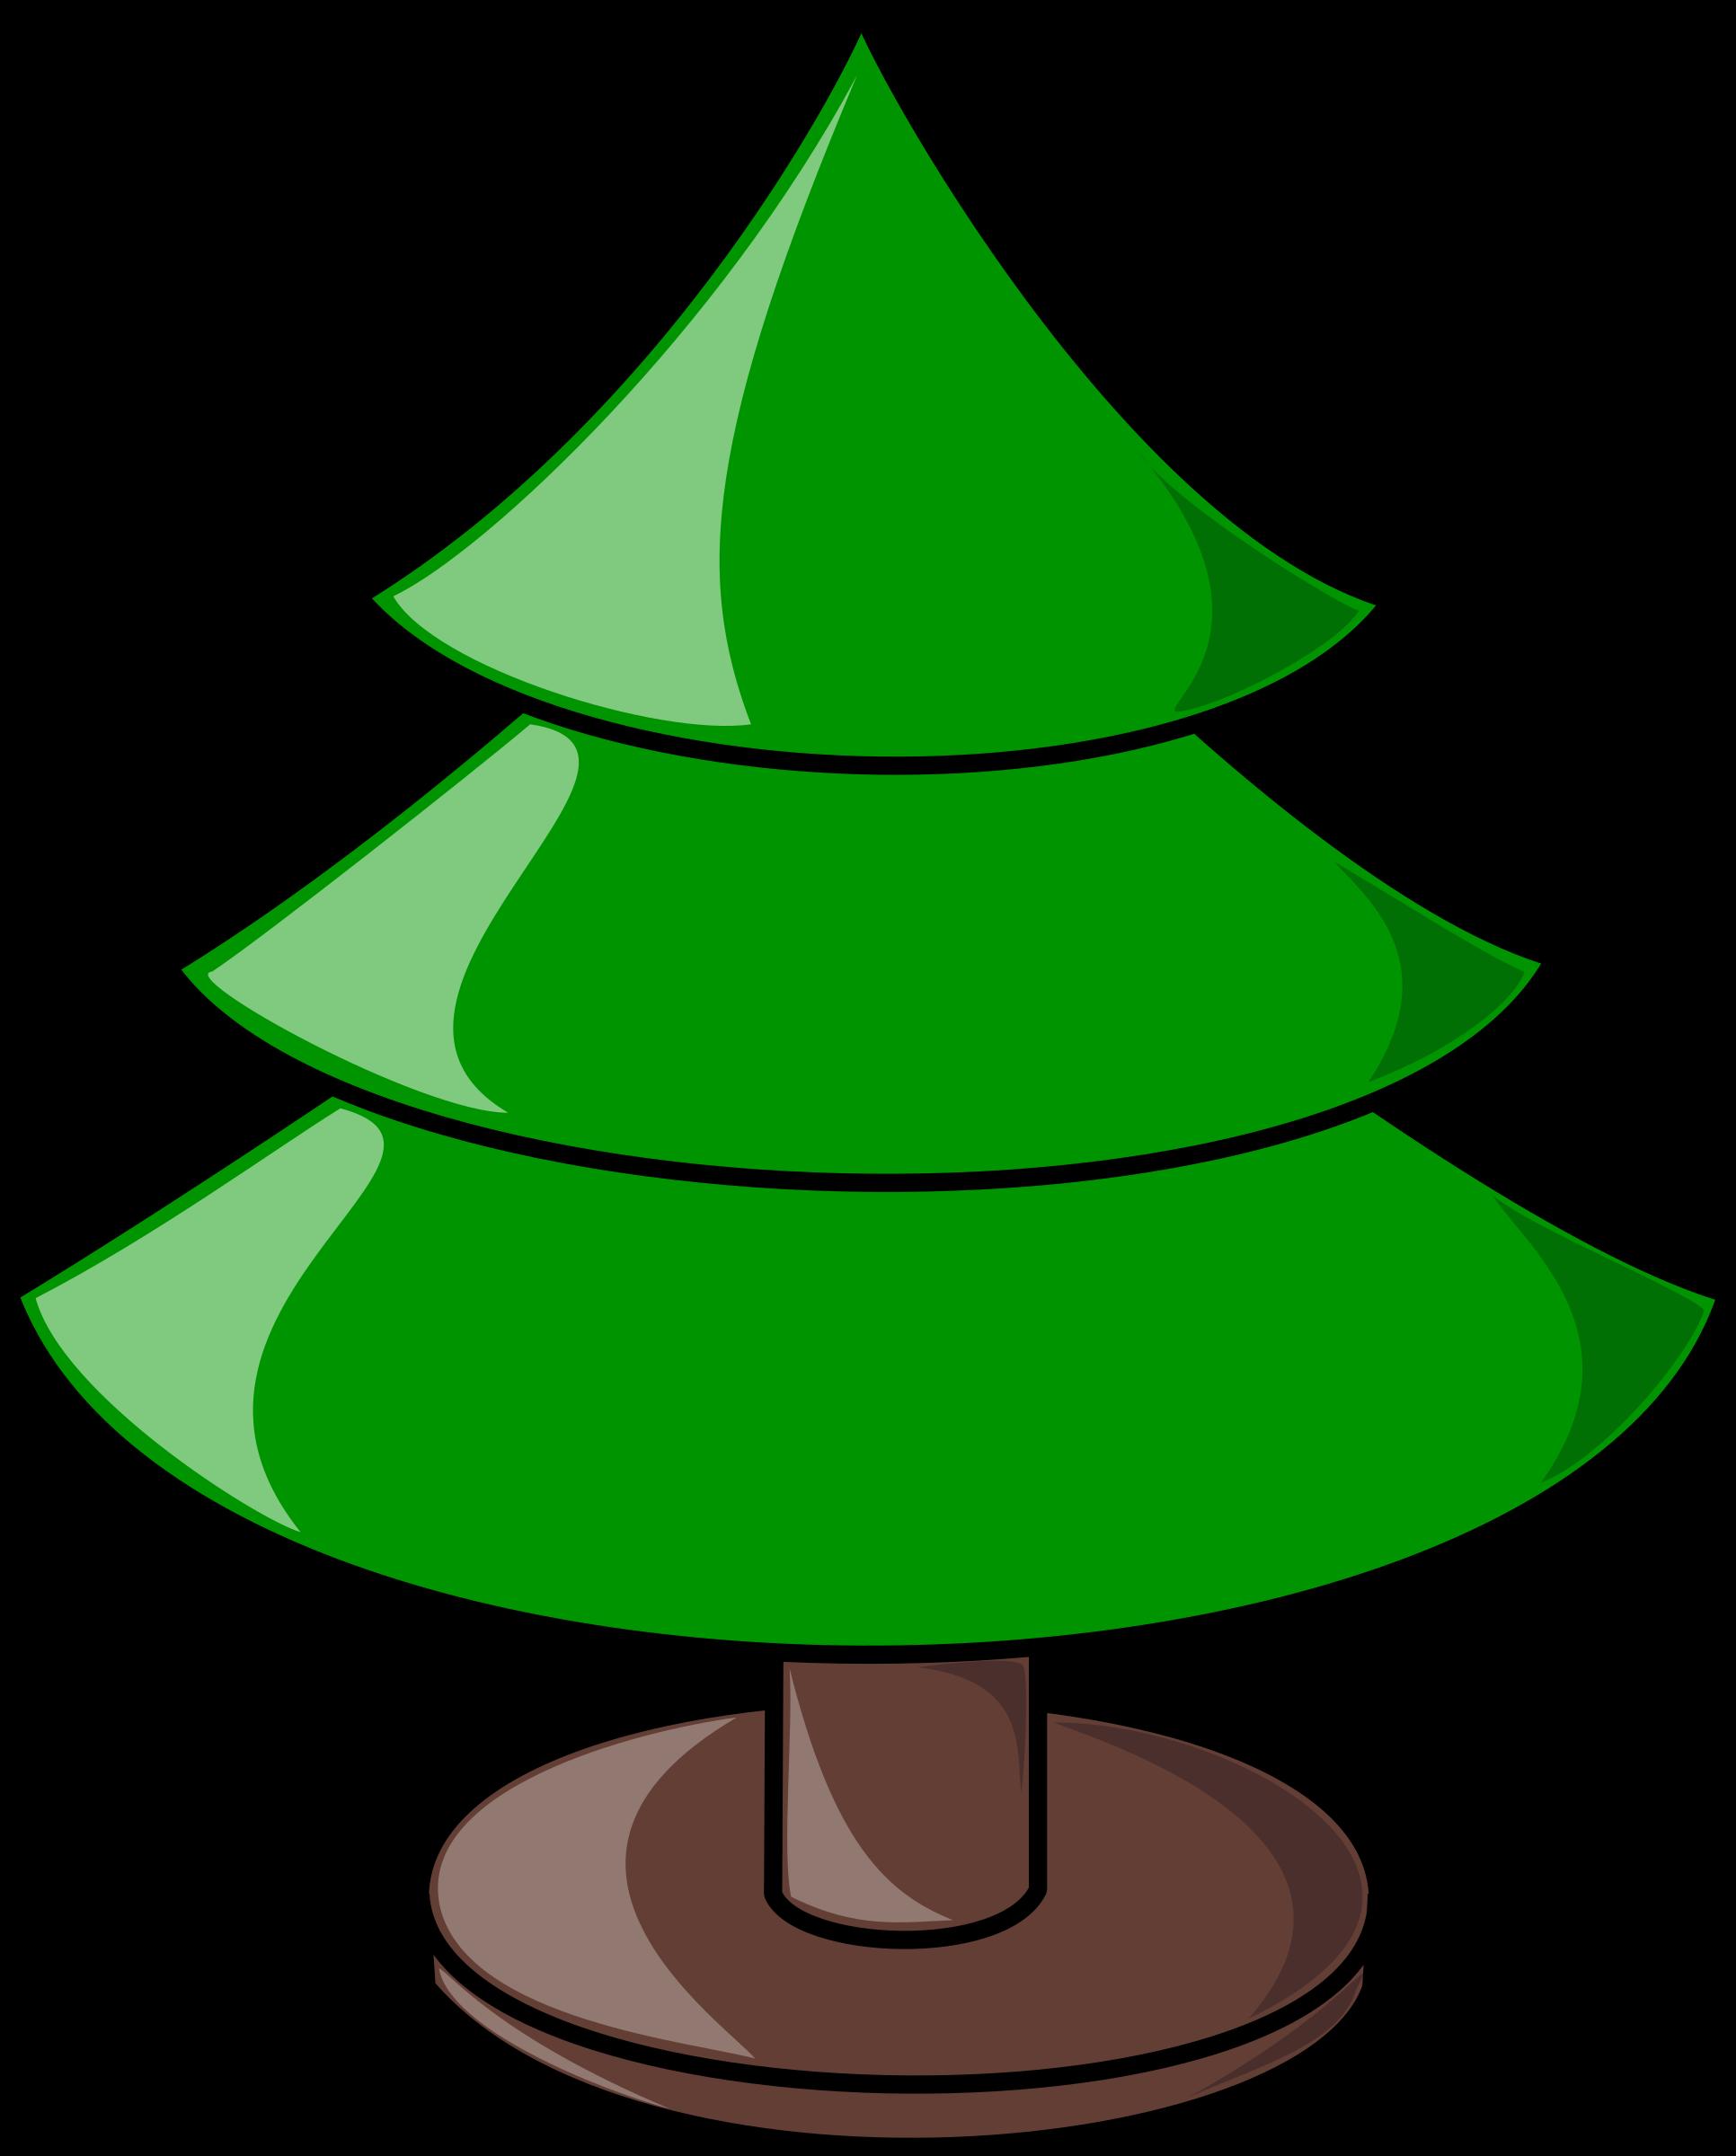 Clipart mustache tree. Christmas plain big image